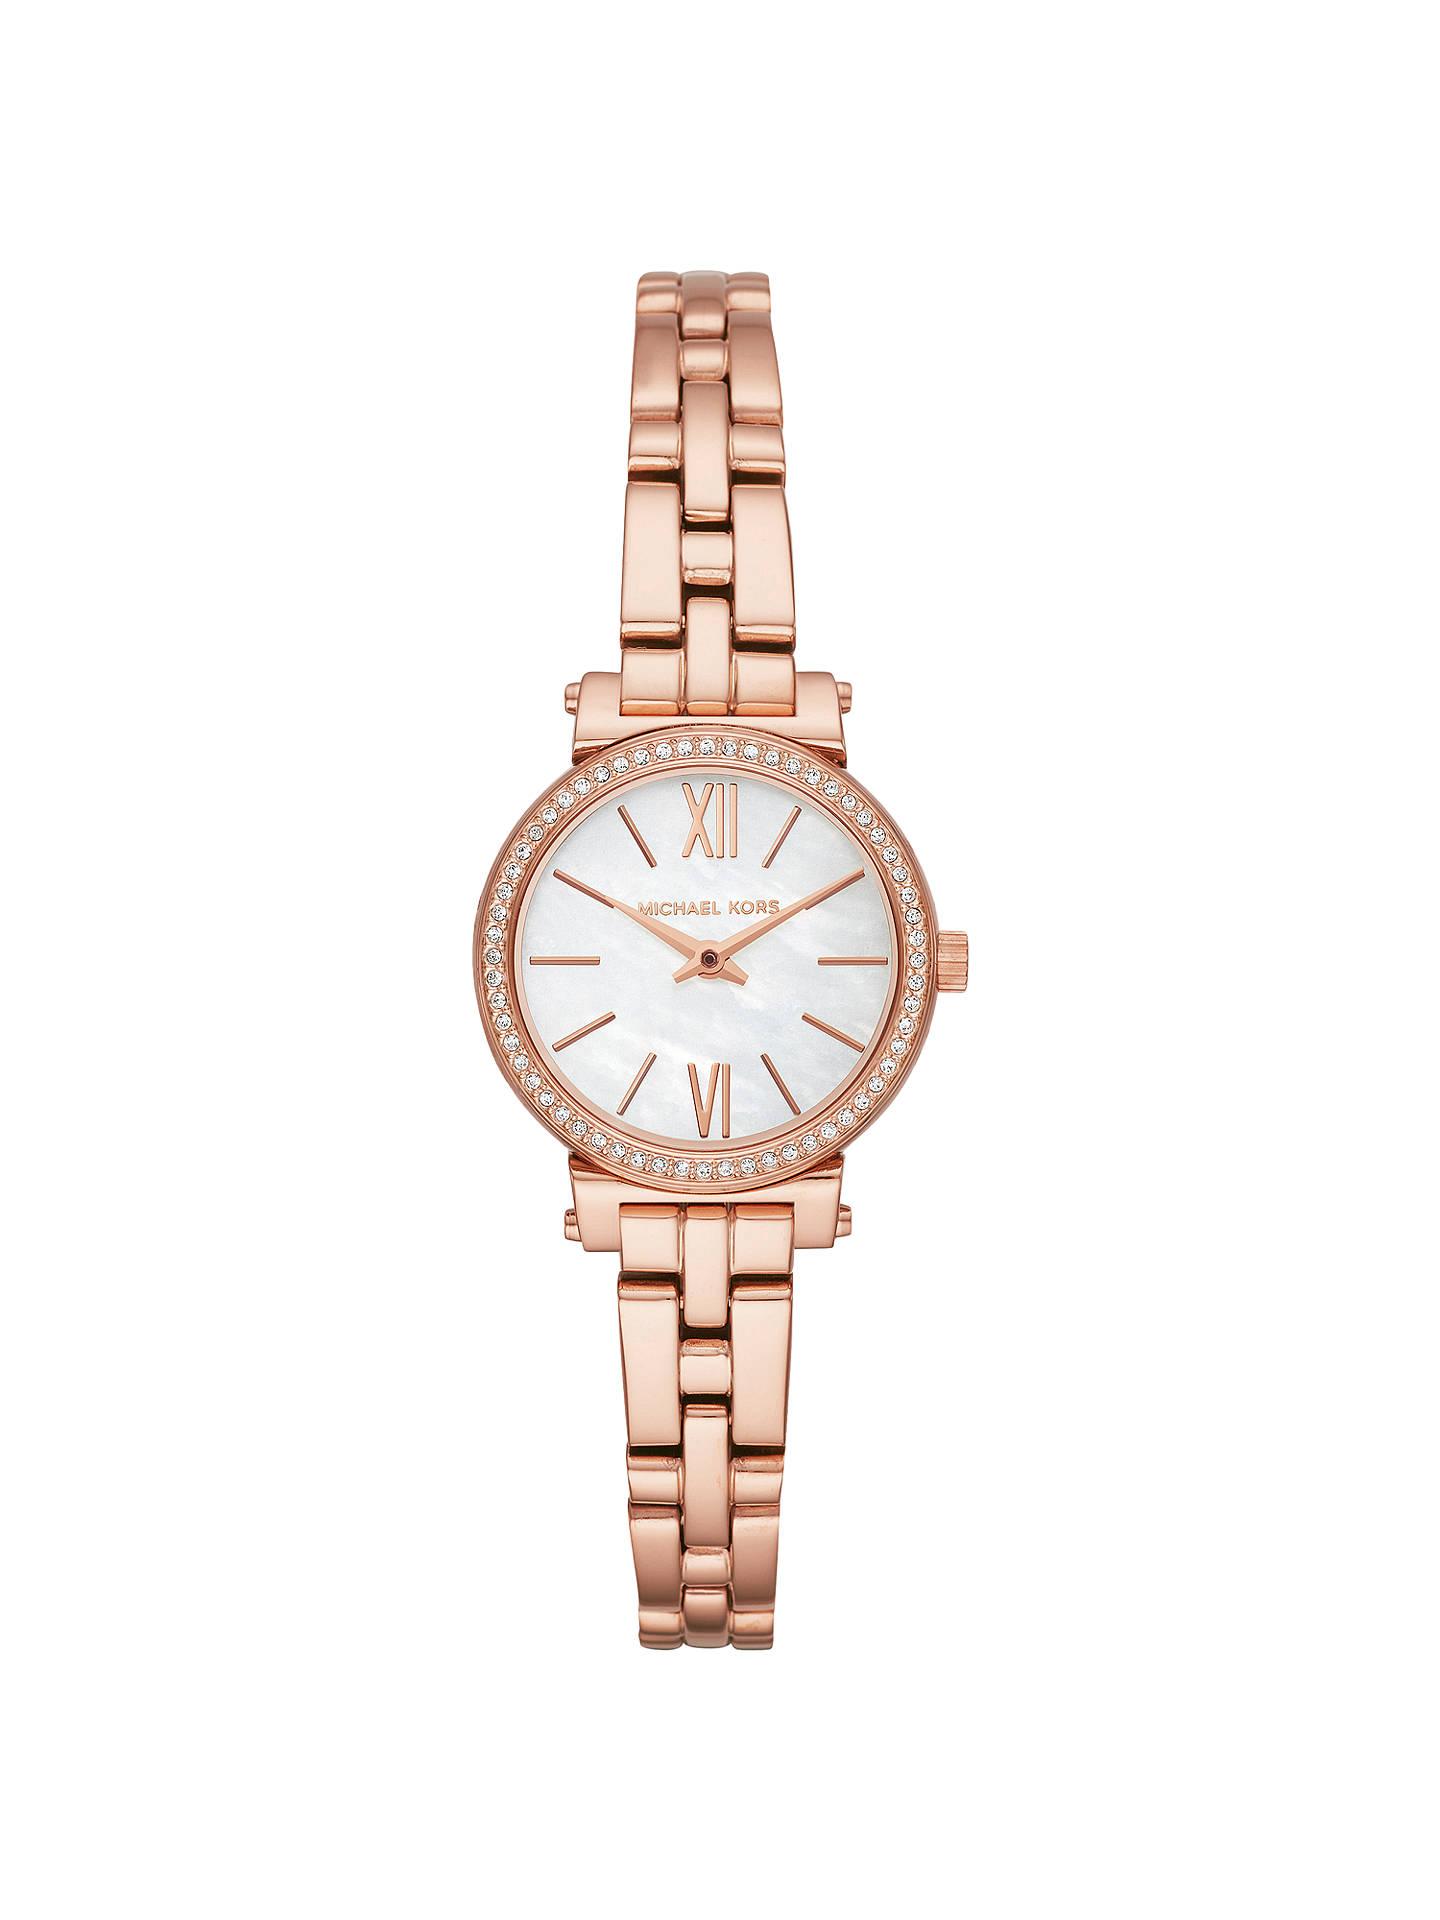 54c3f72a653b Buy Michael Kors MK3834 Women s Petite Sofie Bracelet Strap Watch